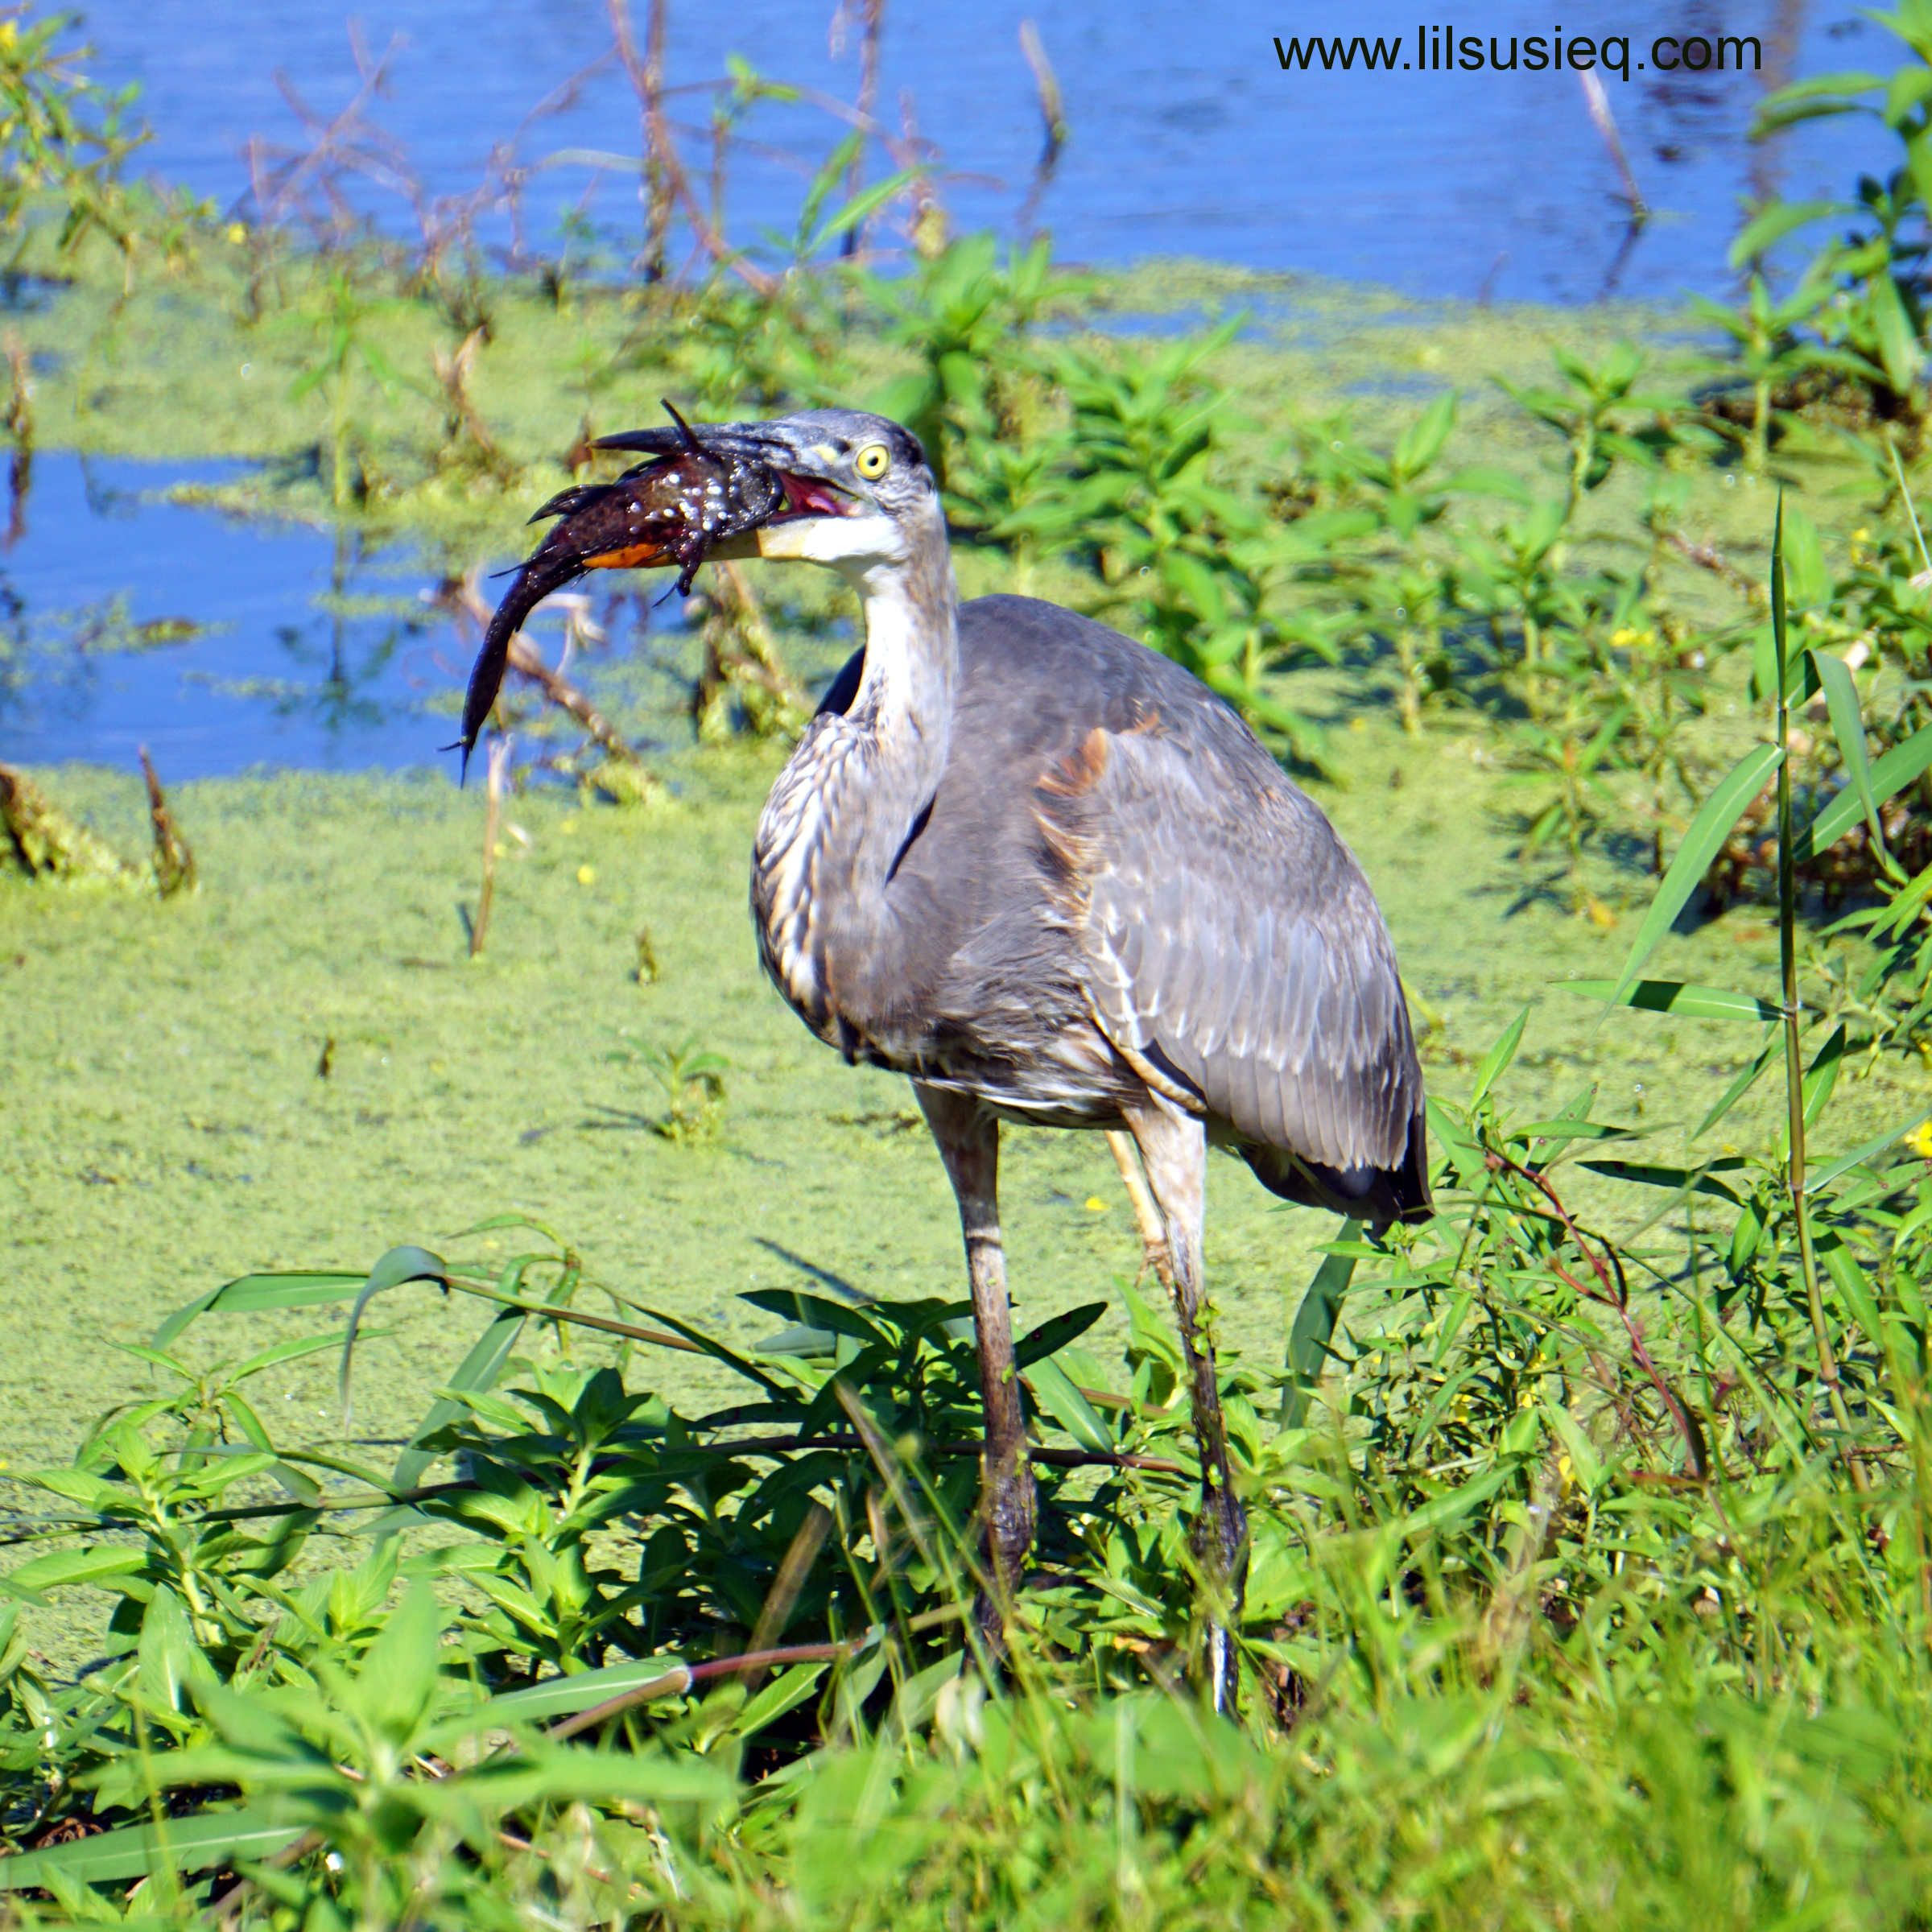 Lake Apopka North Shore: Great Blue Heron Having Fish For Lunch! #wildlife #lake